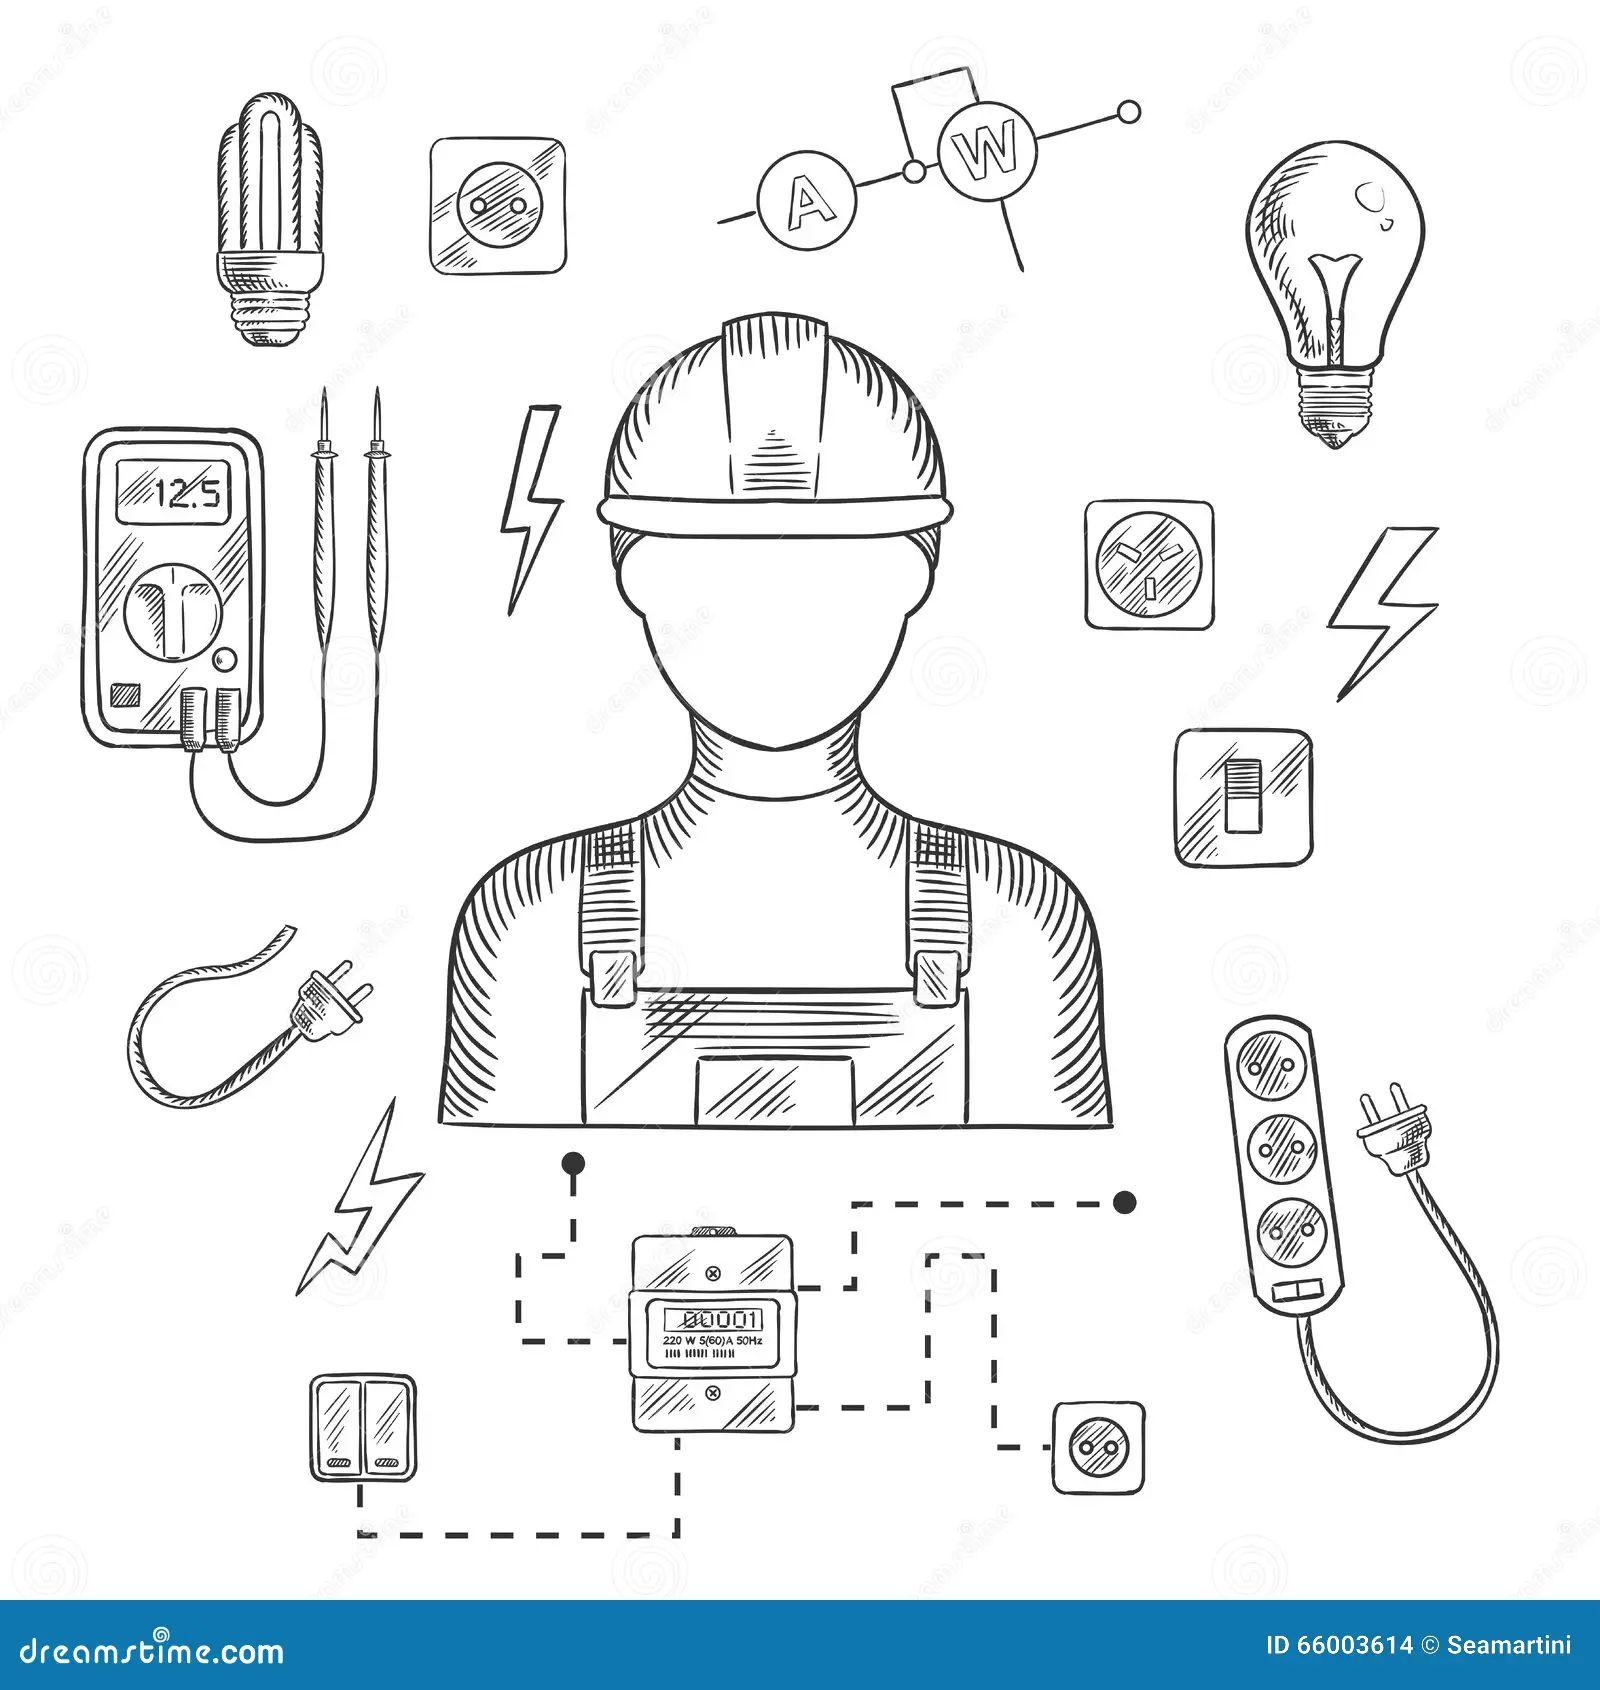 household wiring tester